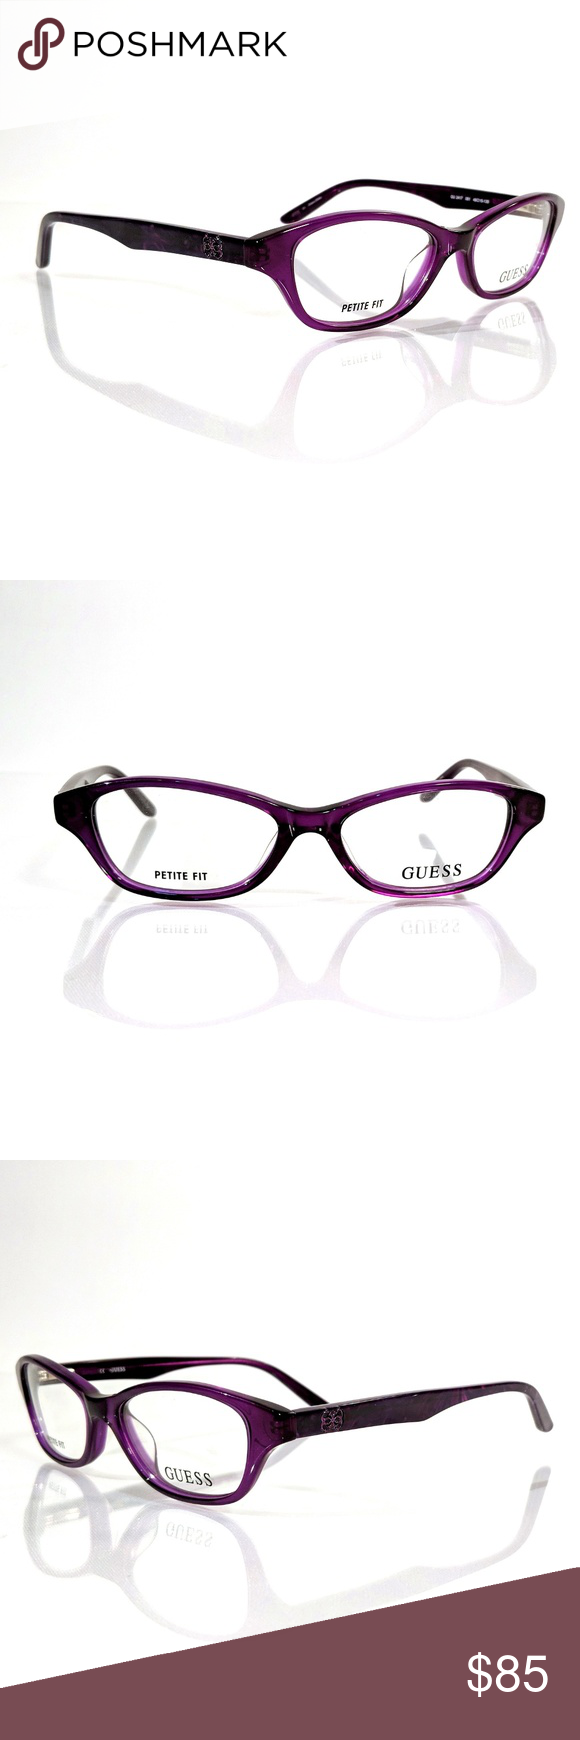 e27e1f63520 GUESS Petite GU 2417 Purple Eyeglasses Frame Brand New Authentic GUESS  Petite Purple Eyeglass Frame Brand